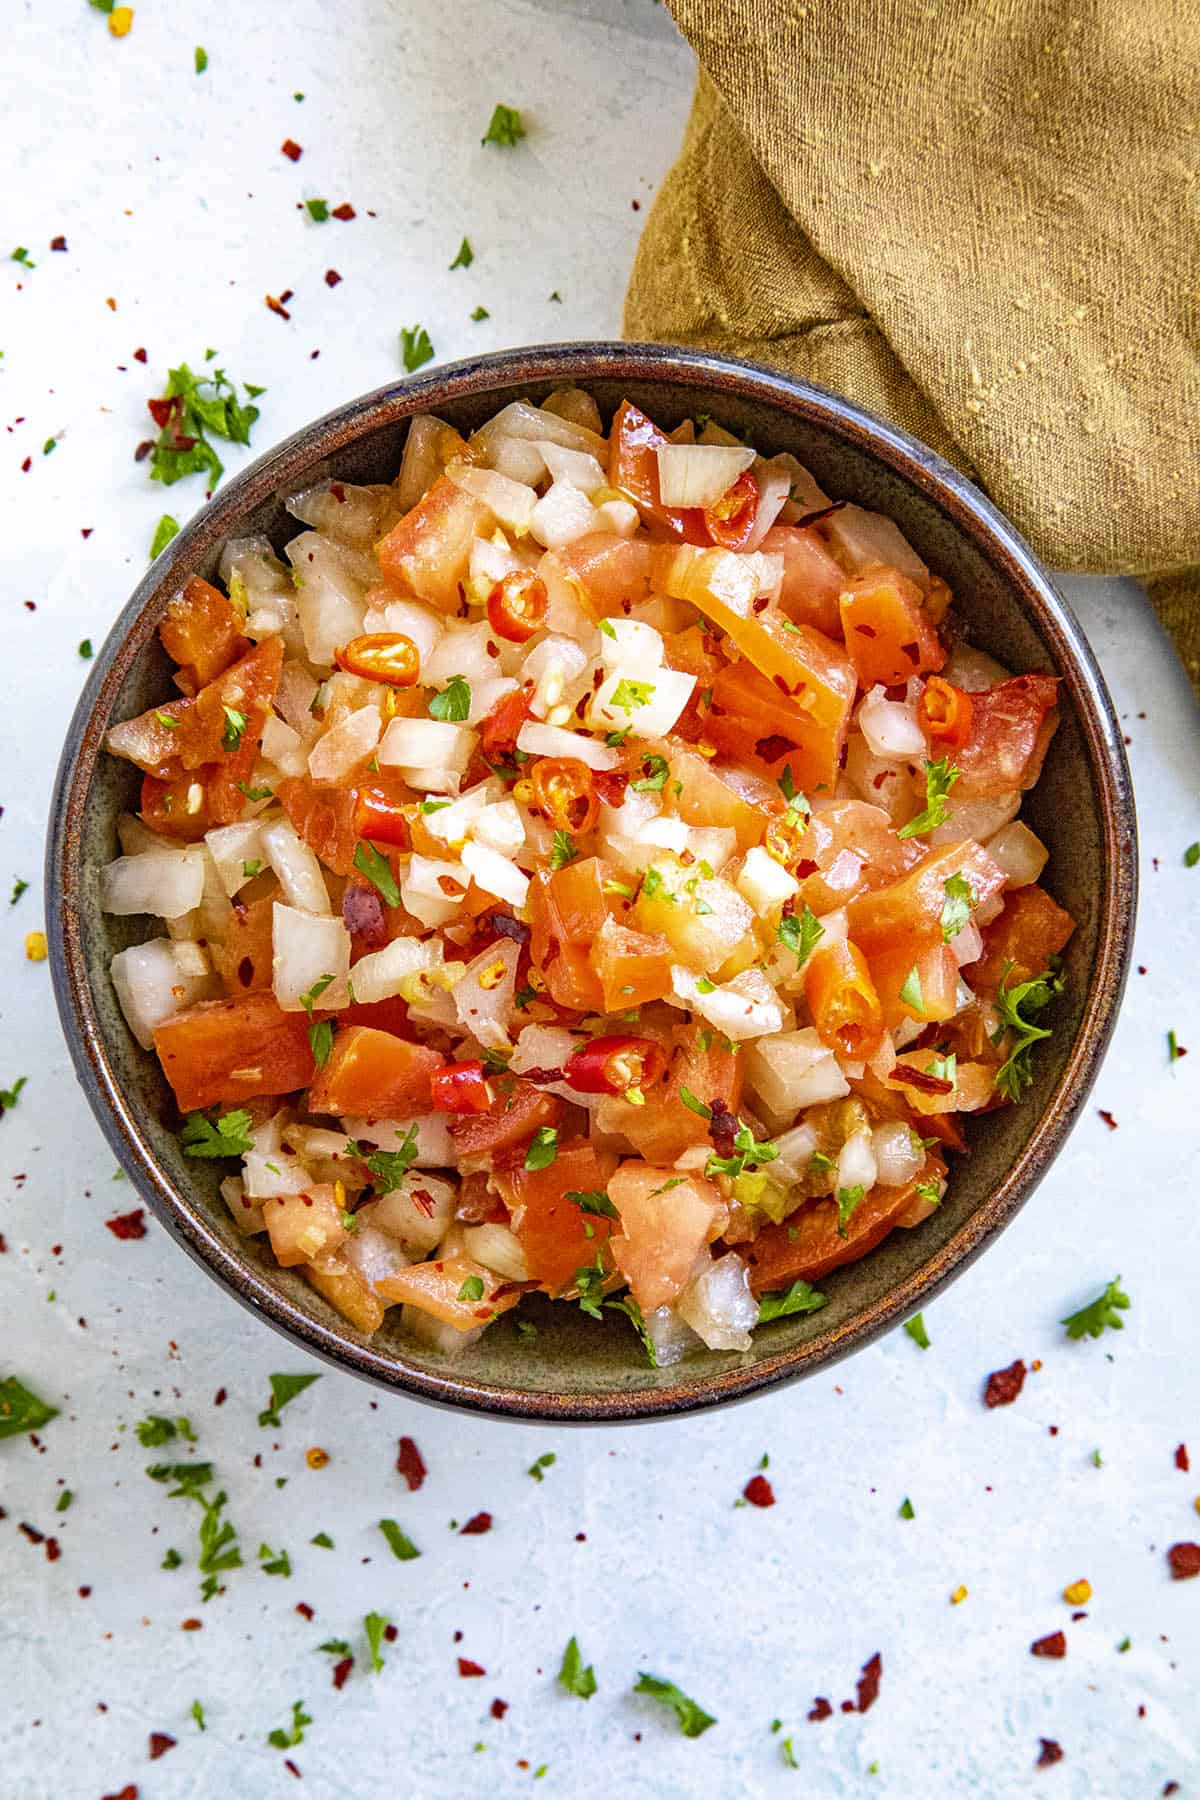 Spicy Sambal Matah in a bowl